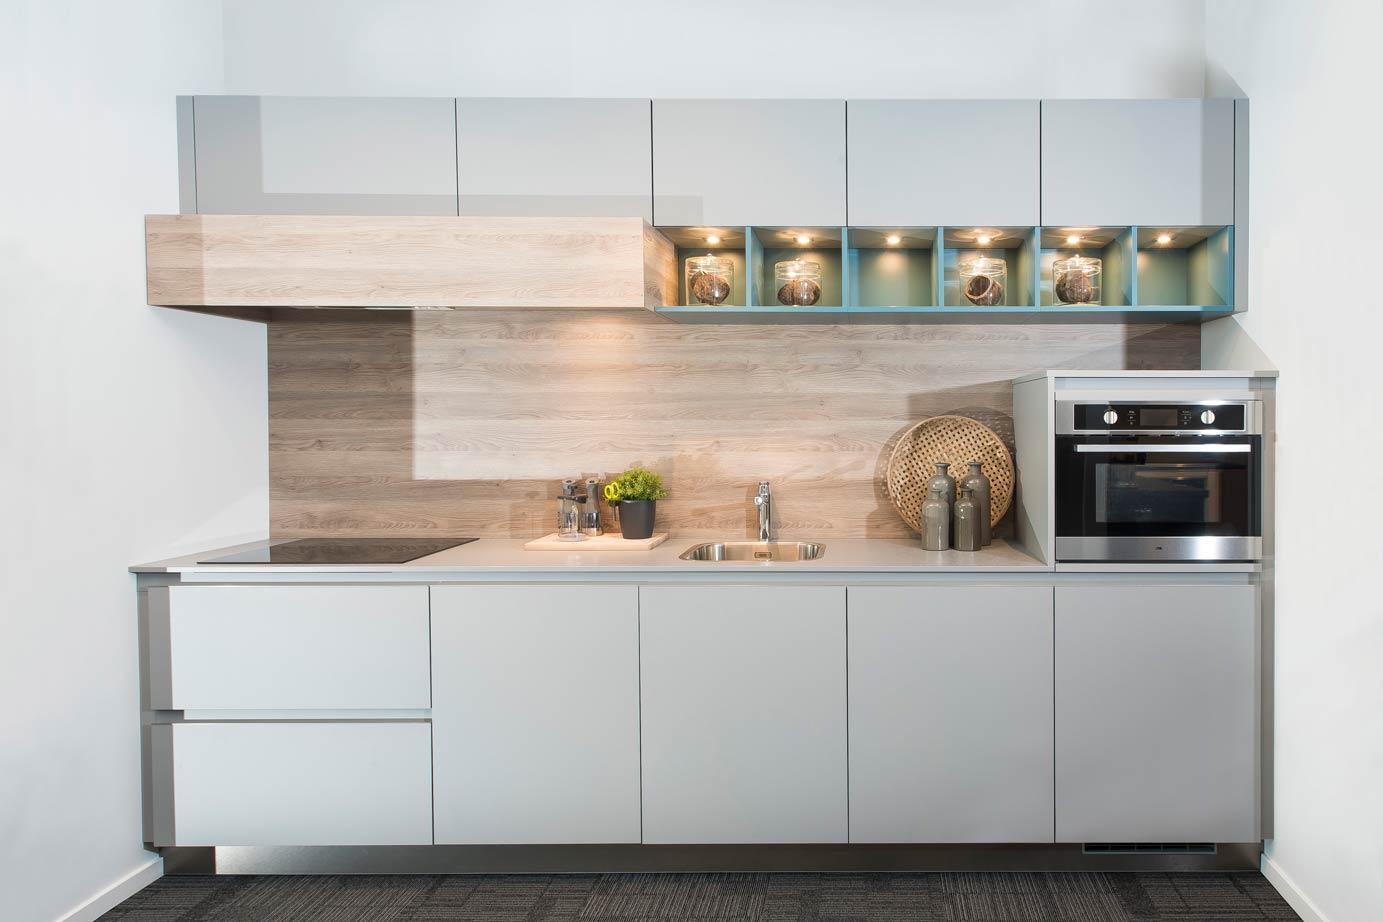 Moderne Keuken Grijs : Grijze keuken inclusief etna apparatuur db keukens